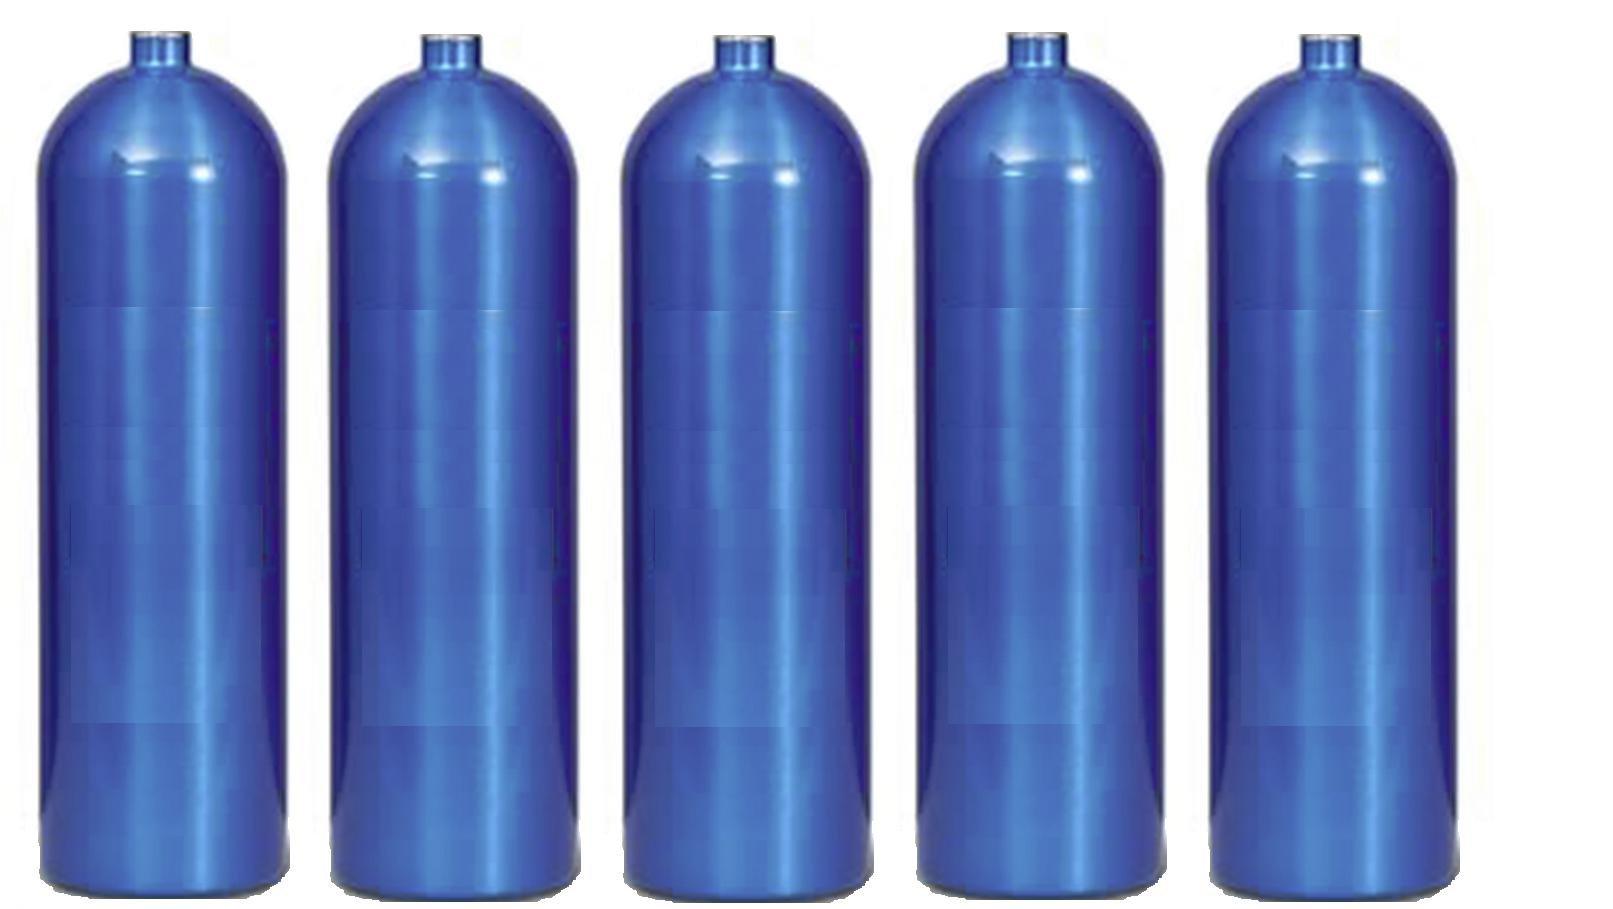 6 Sigma 5 Refills Microburst Nitrous Oxide NOs XL Cartridge 20 cc Bottles